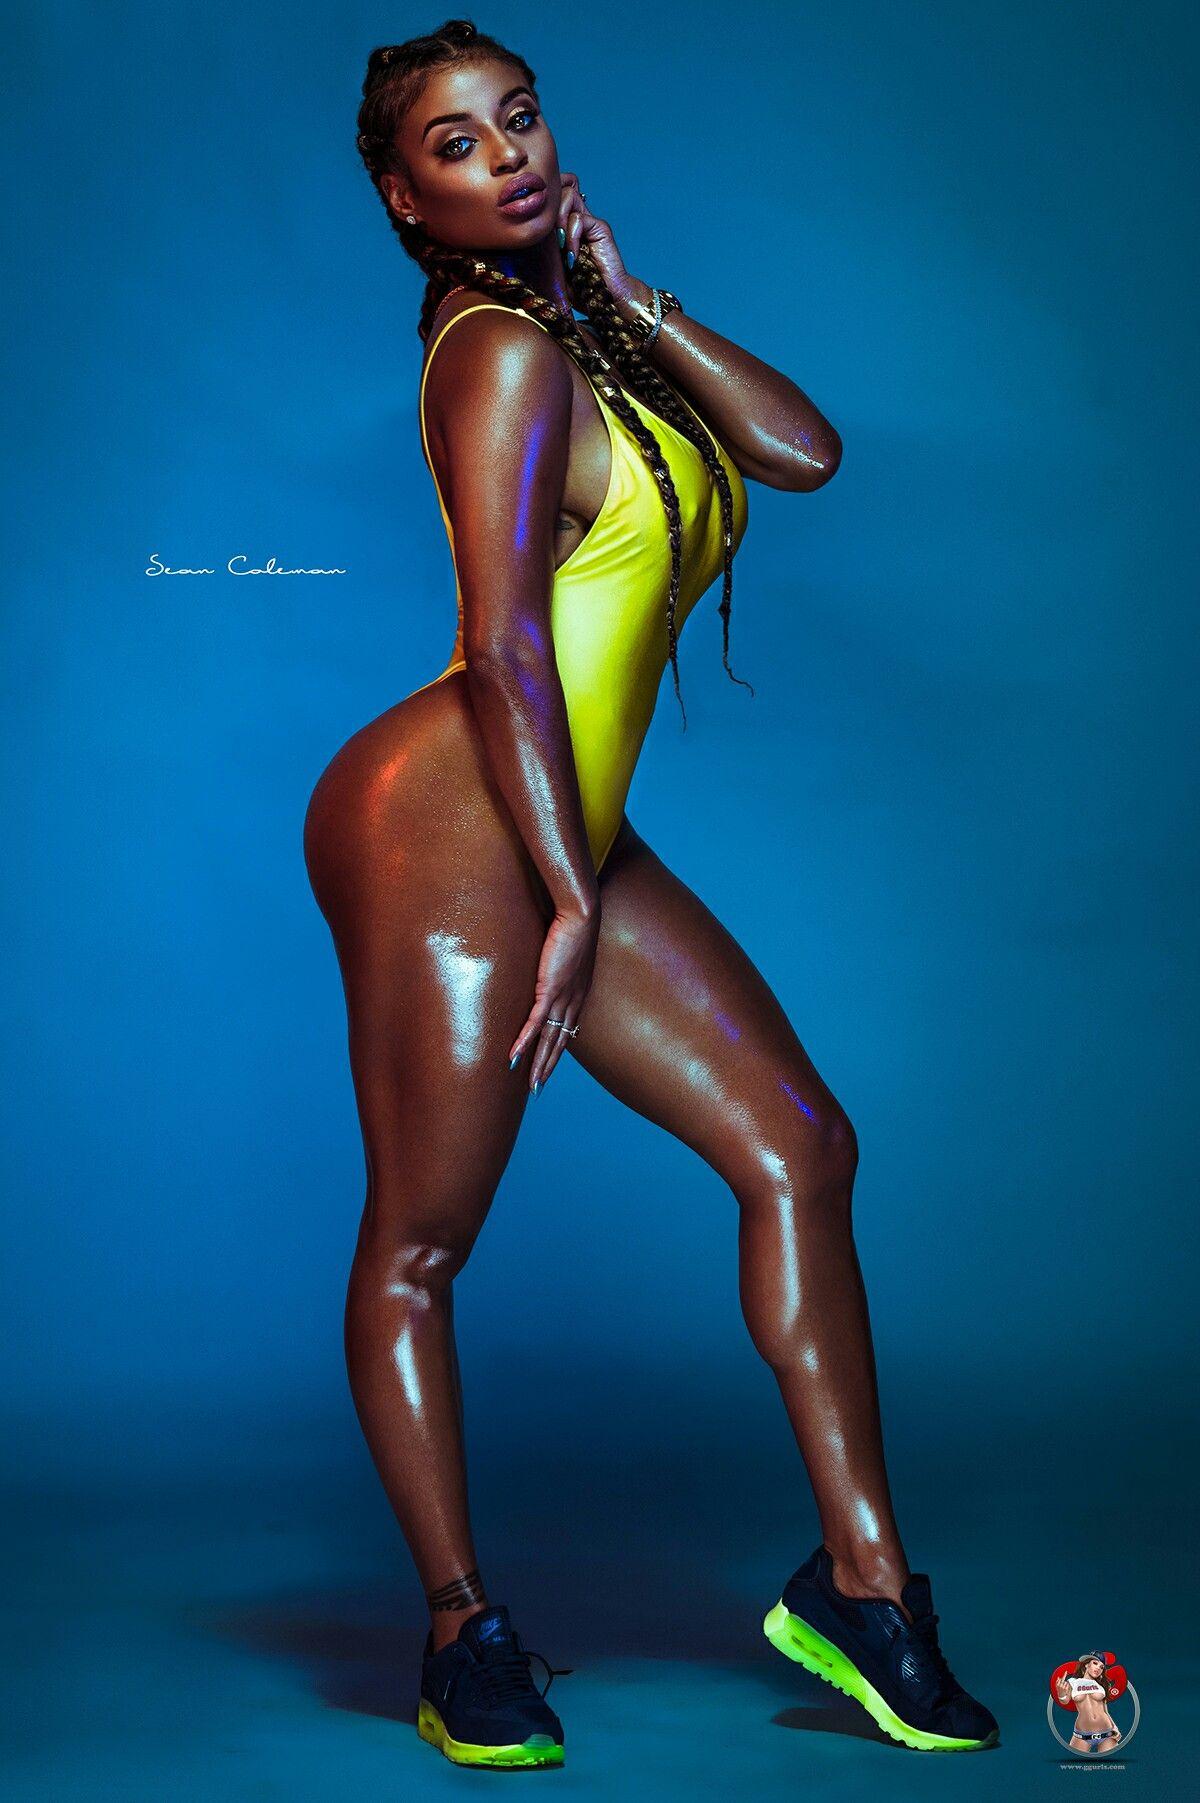 pinnigel hilliard on 26 | pinterest | curves, black goddess and